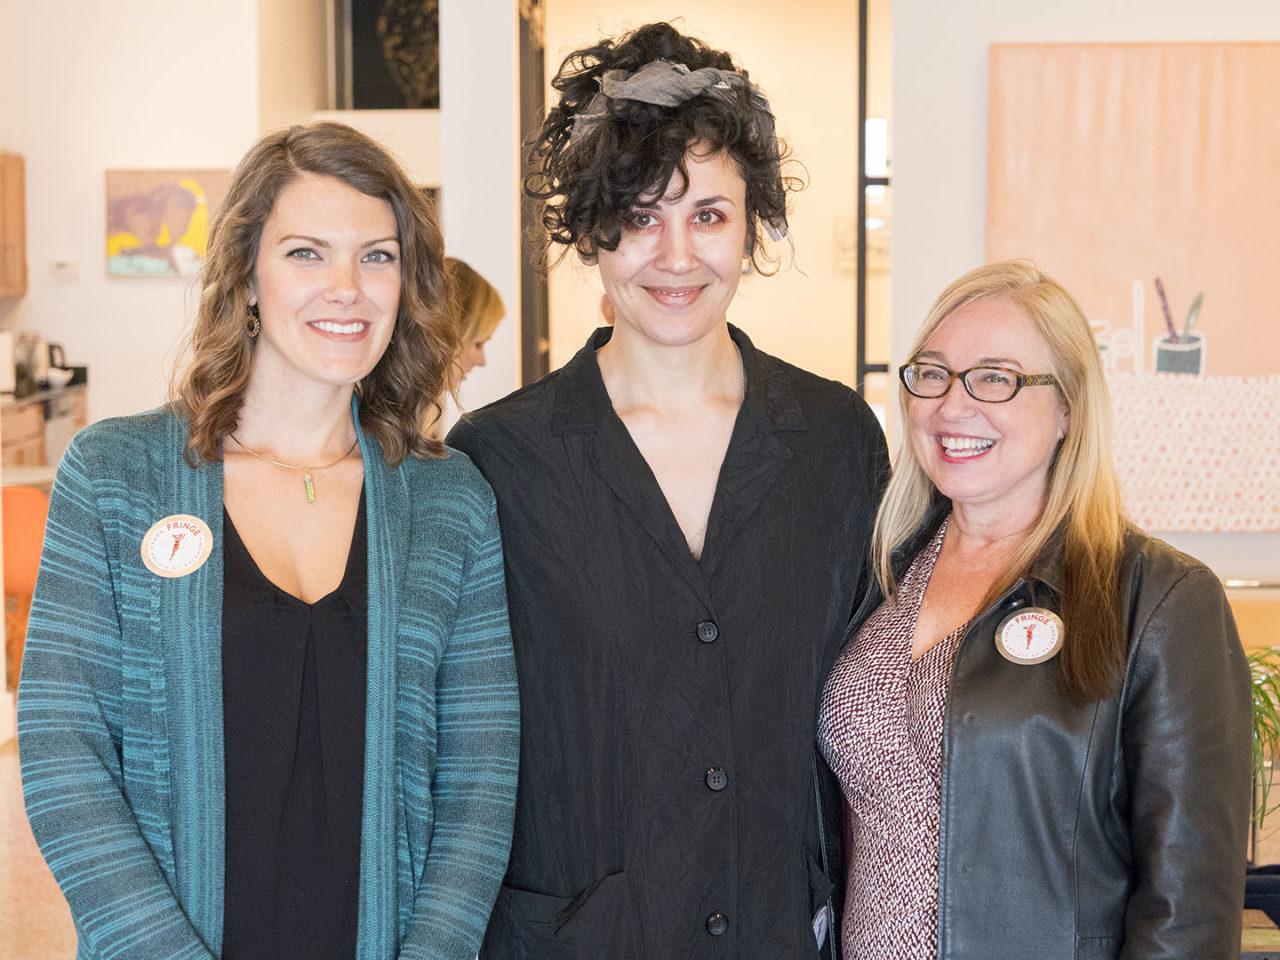 Sarah Day-Short, Alexis Austin, and Debra Ashley at Chromatic Ritual - photo by Dennis Spielman